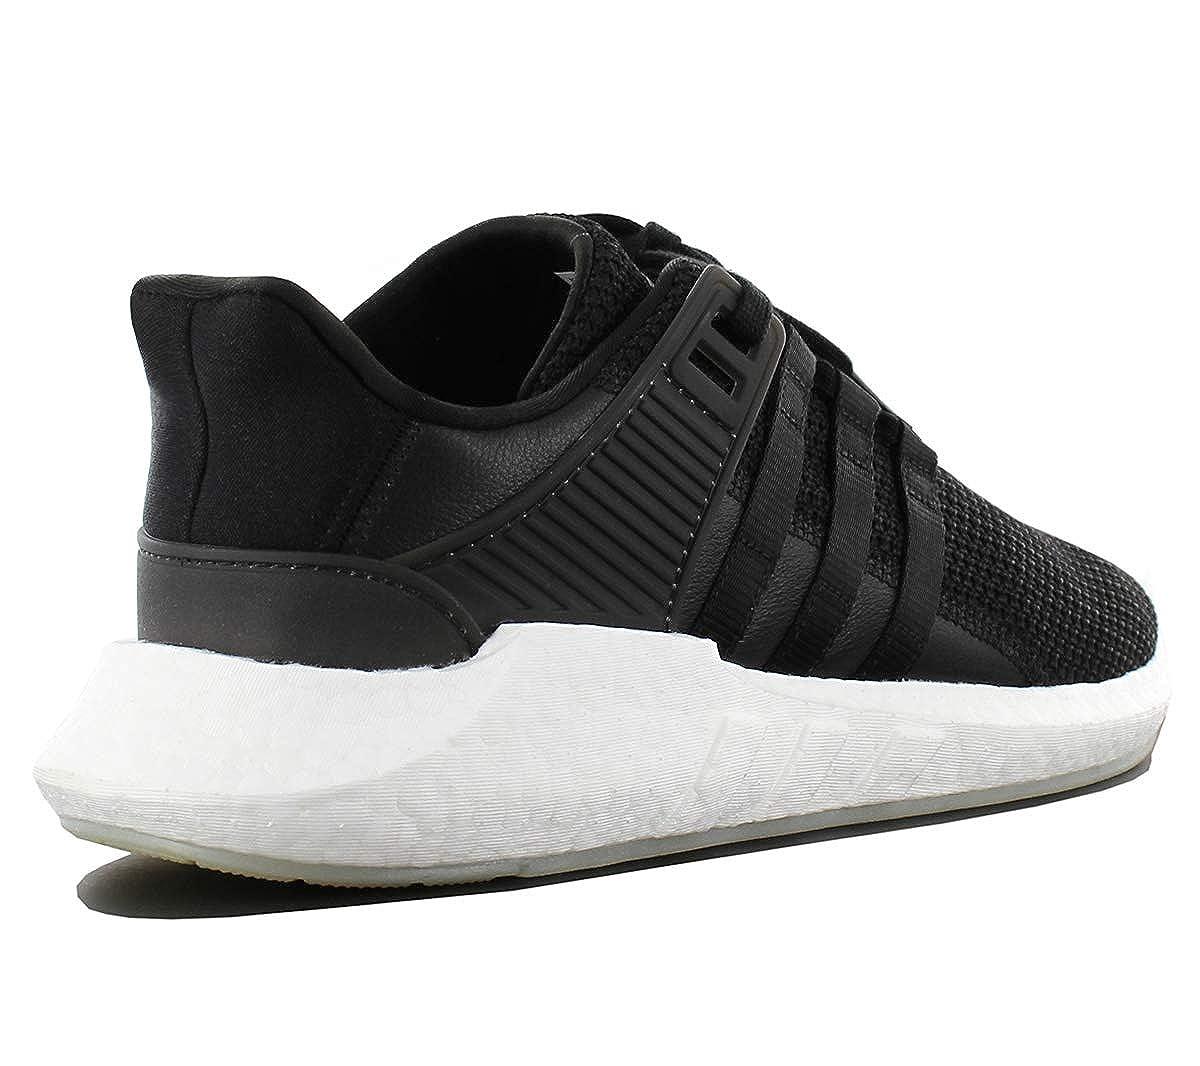 best sneakers 63aeb 00733 Amazon.com   adidas Originals Men s Sneaker EQT Support 93 17 Nera  11(UK)-11½(US) Black   Fashion Sneakers